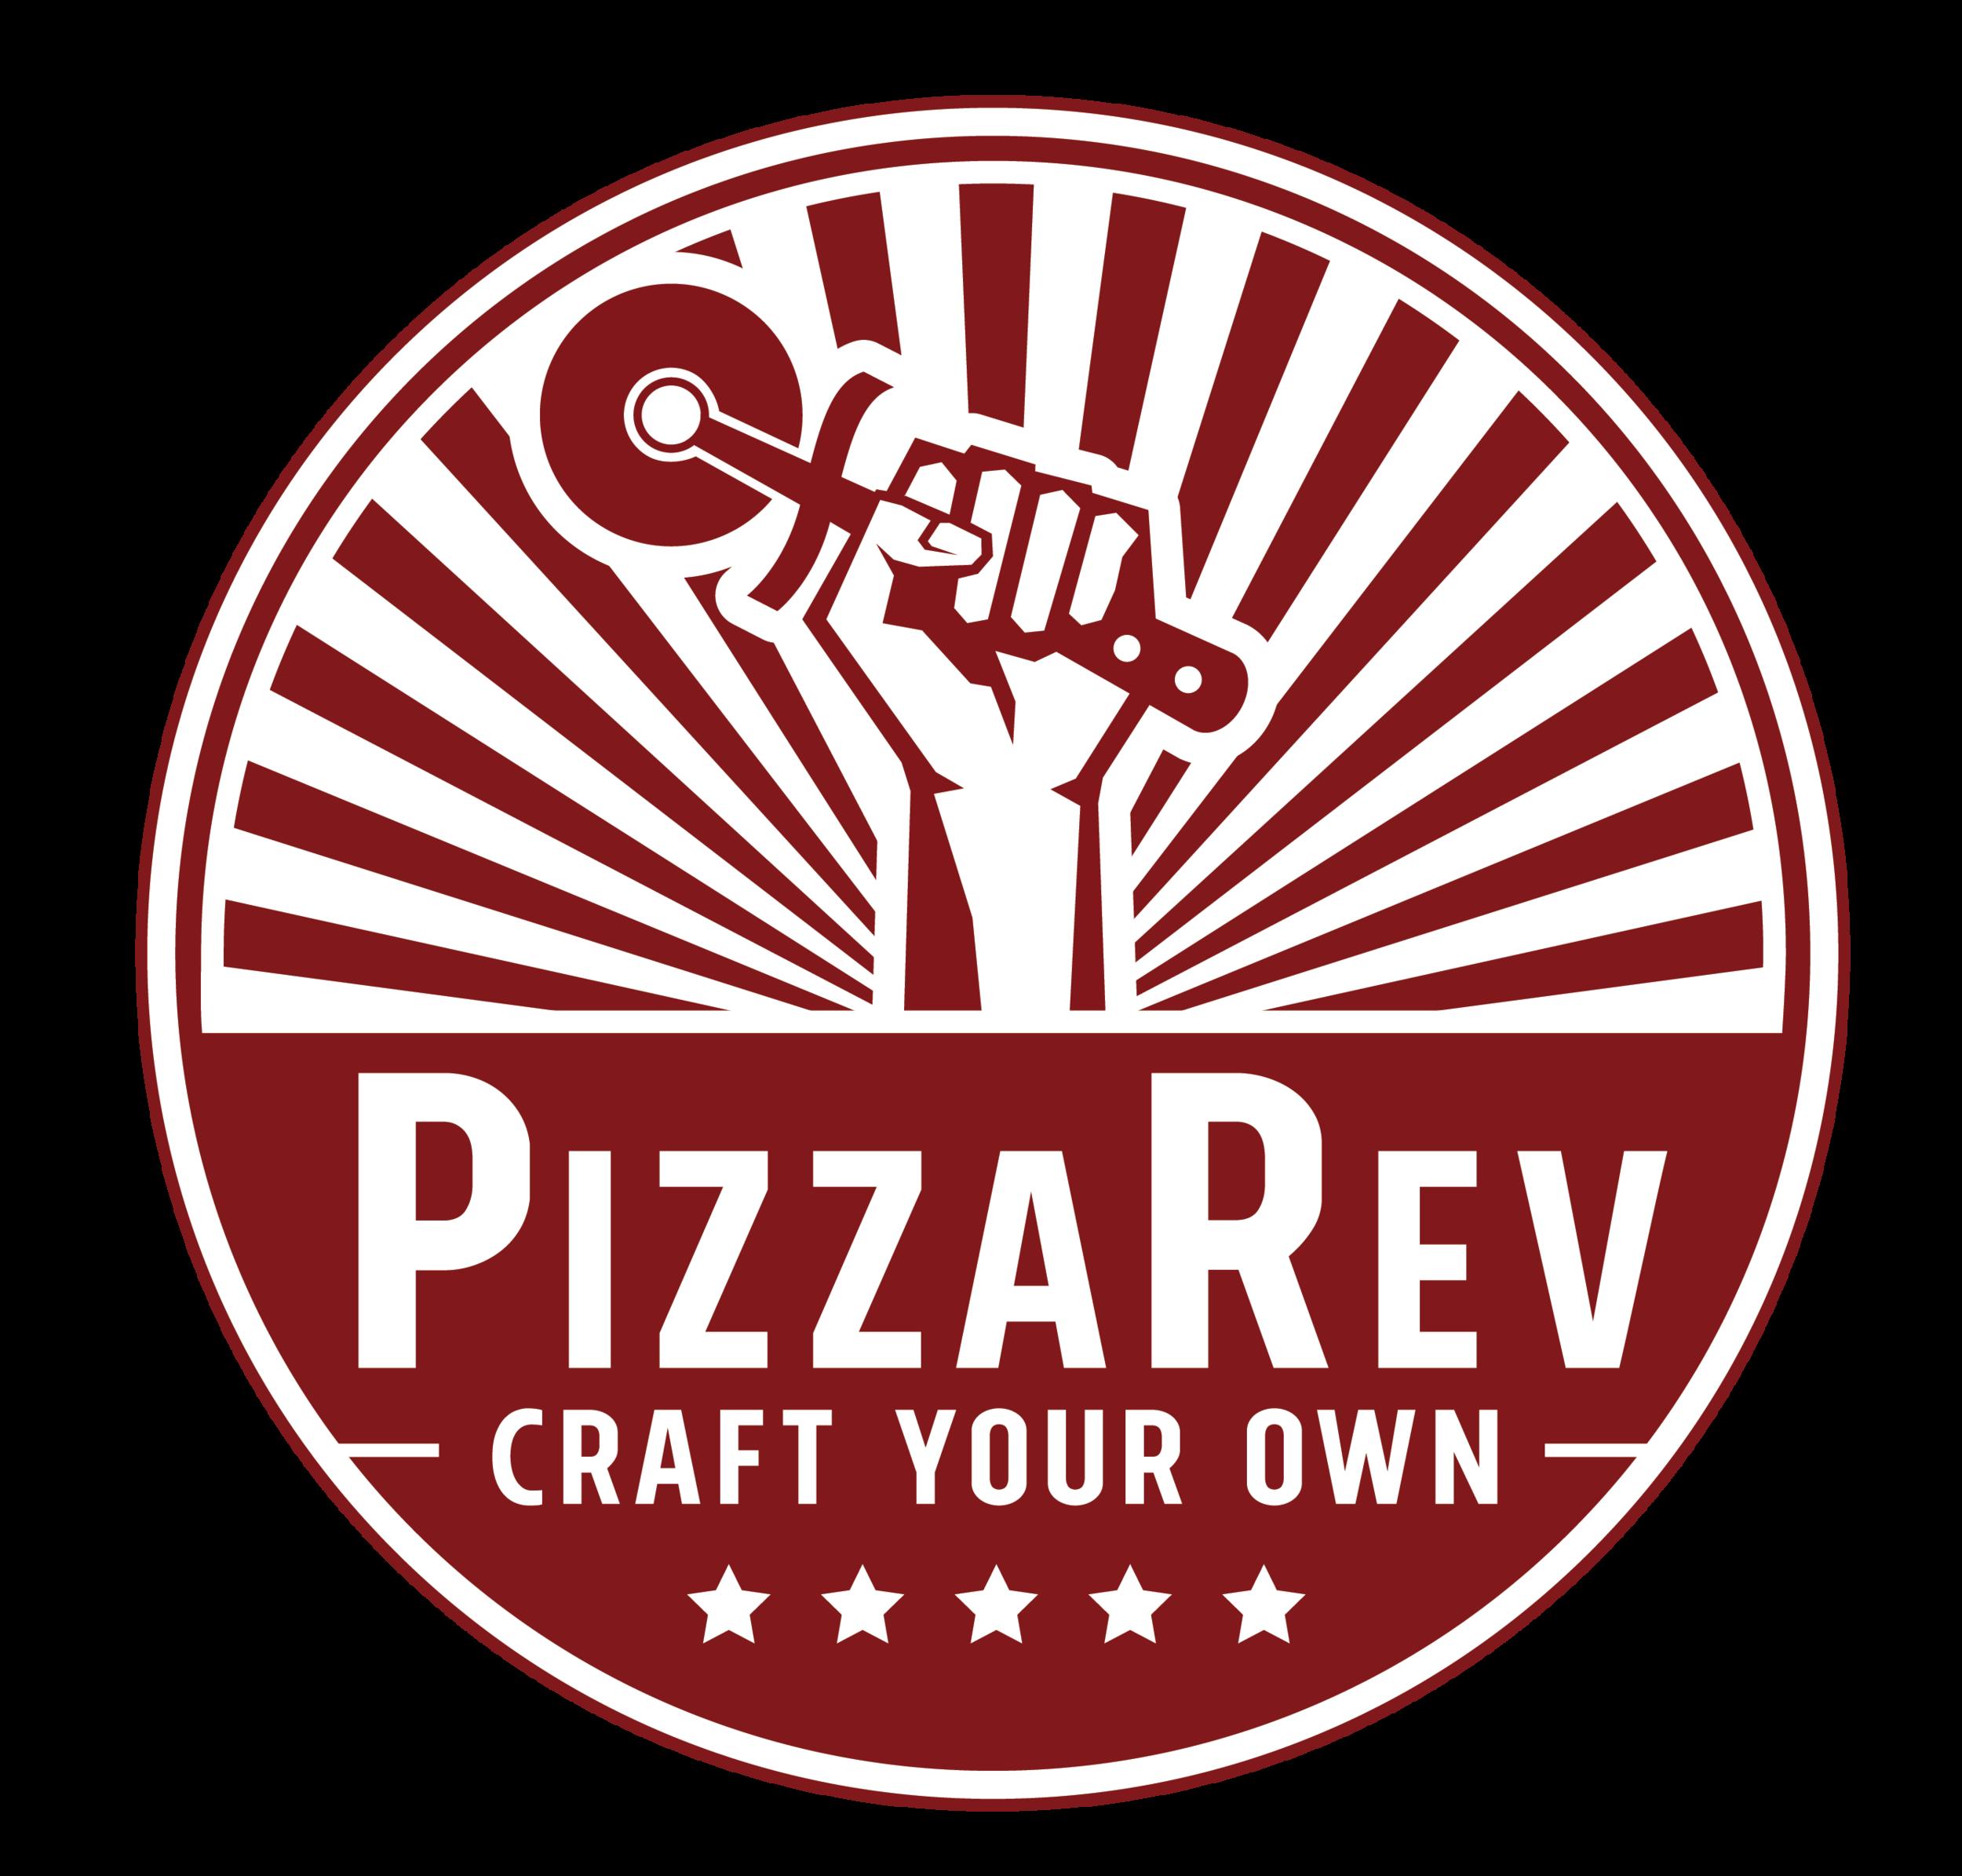 Secondary_Logo_PizzaRev_Badge_FullColor_2016.png